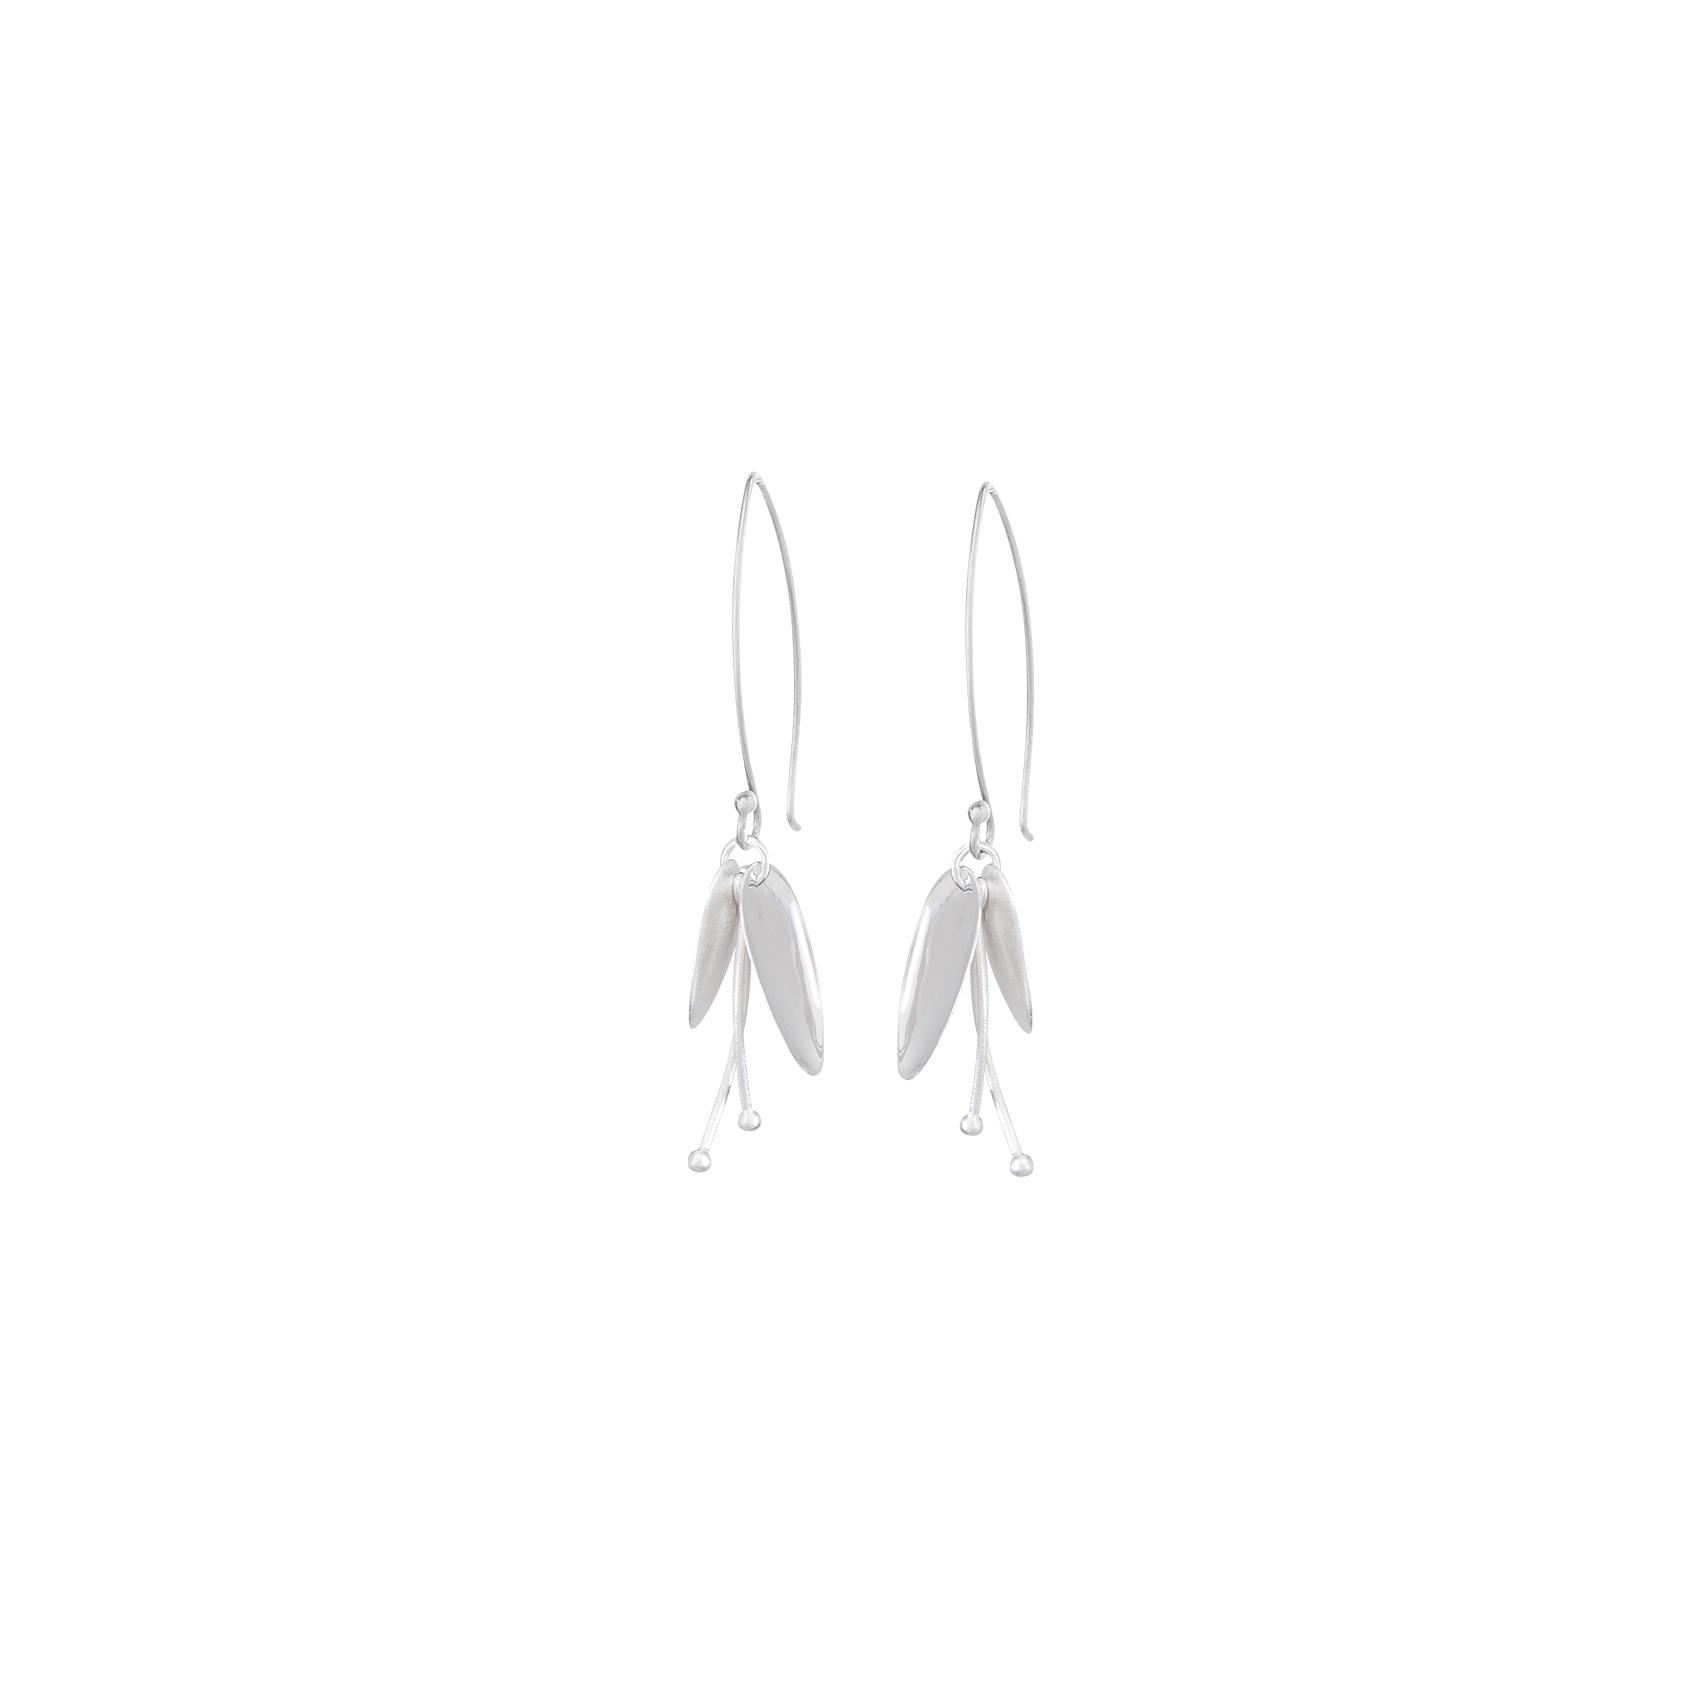 Lily Flower small earrings